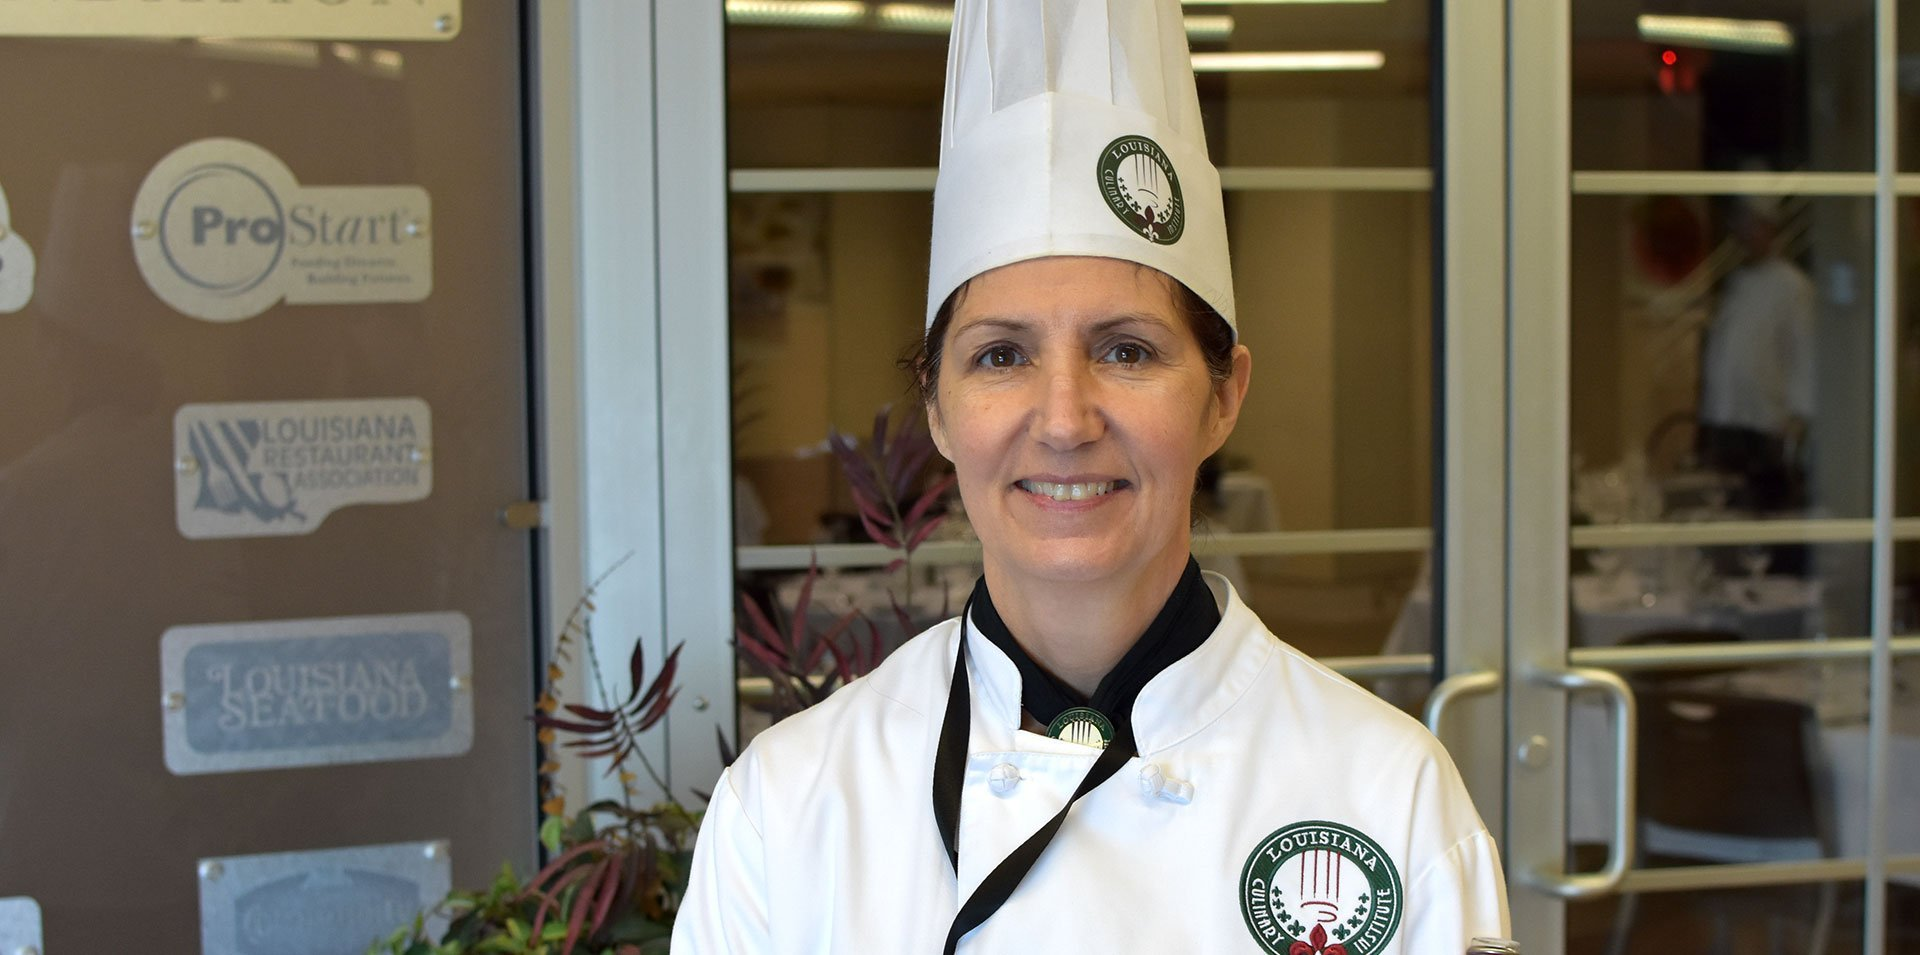 Chef Christina Nicosia Lead Pastry Instructor at LCI